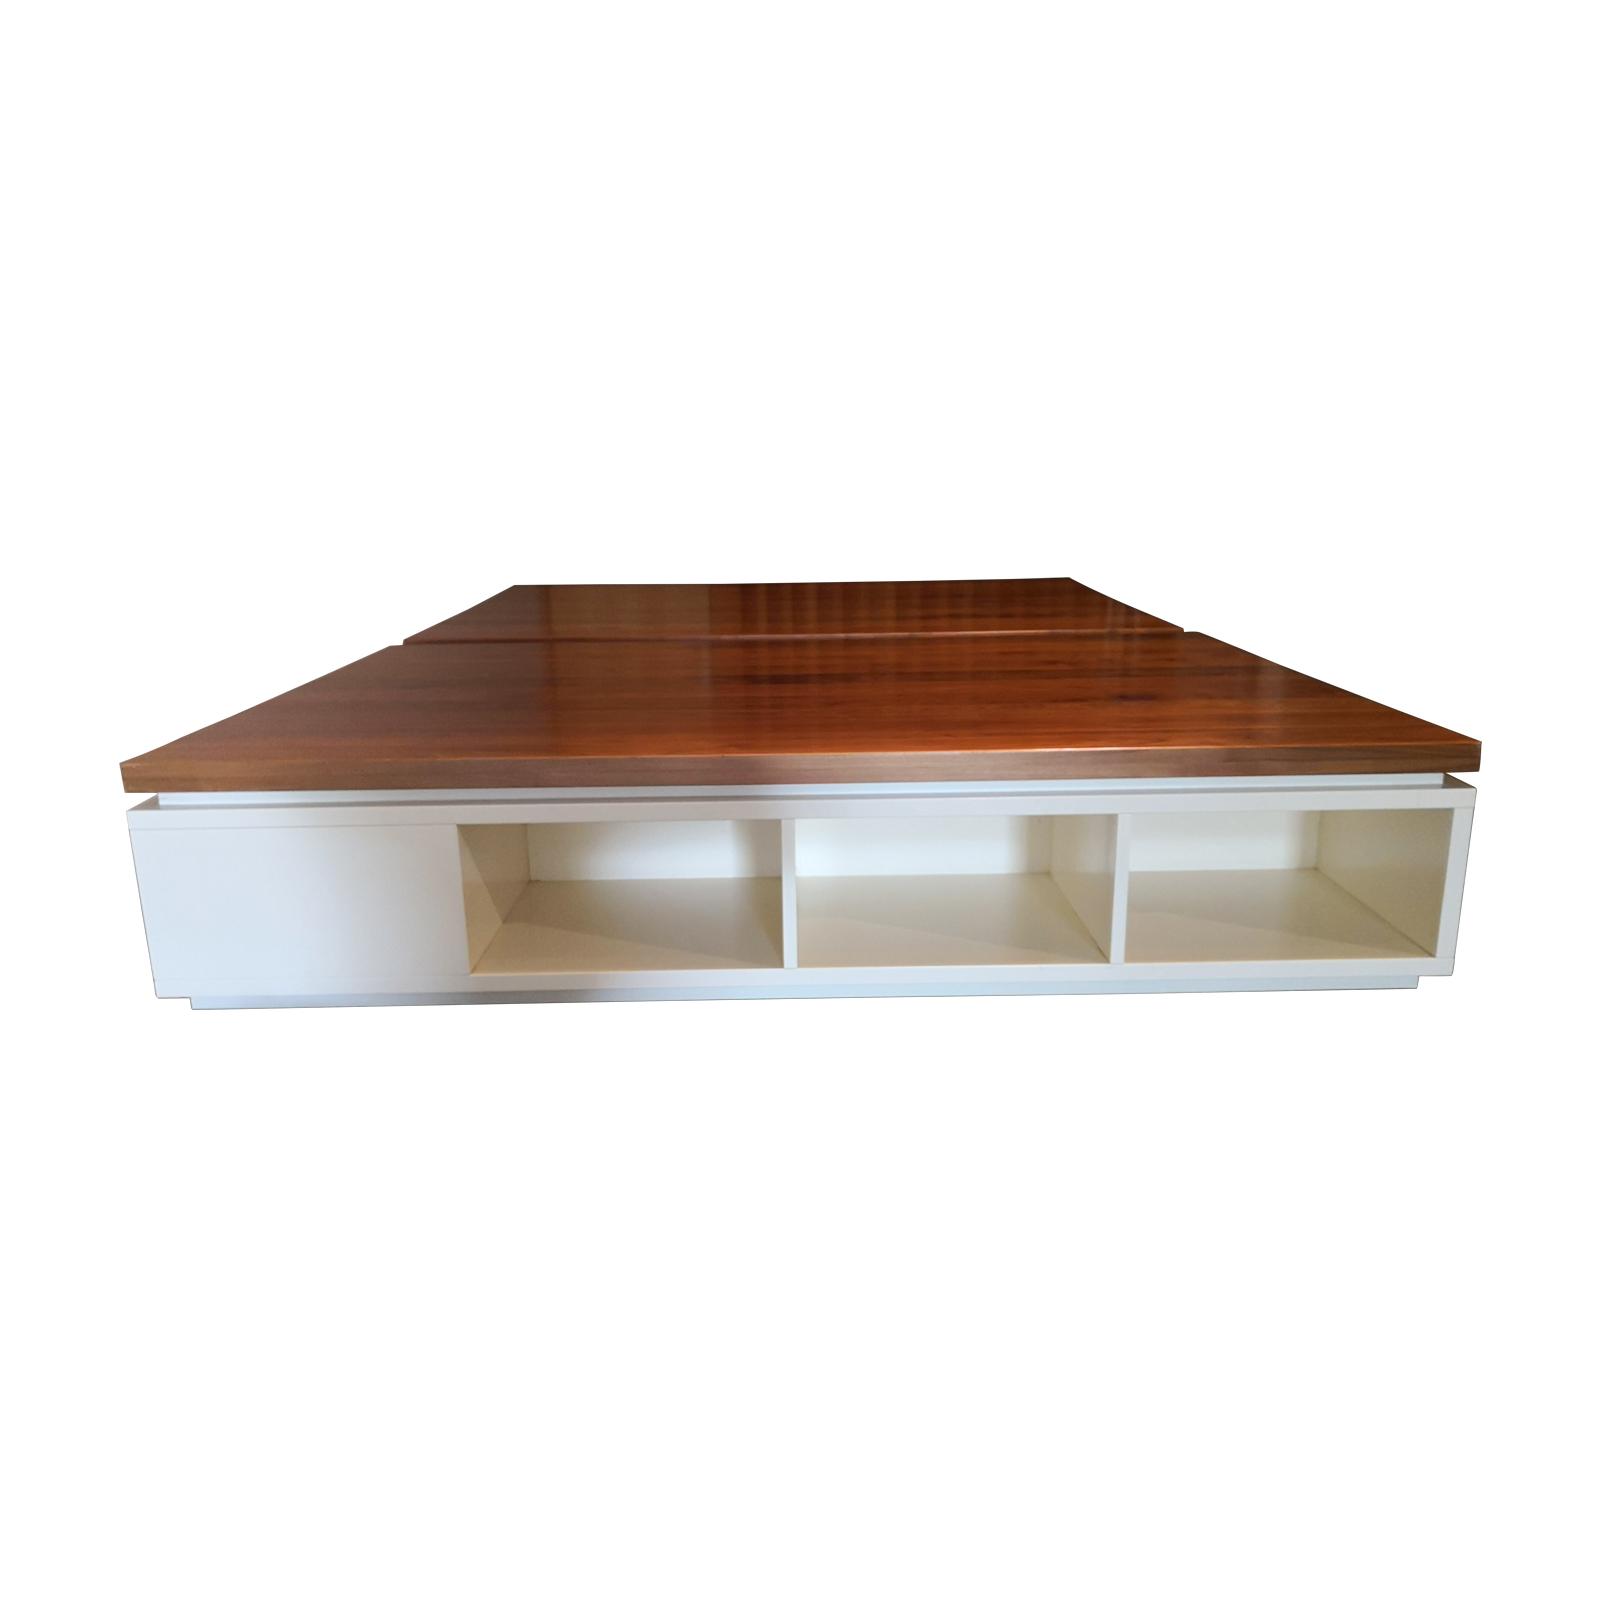 Two Design Lovers kids platform bed base and storage side set two